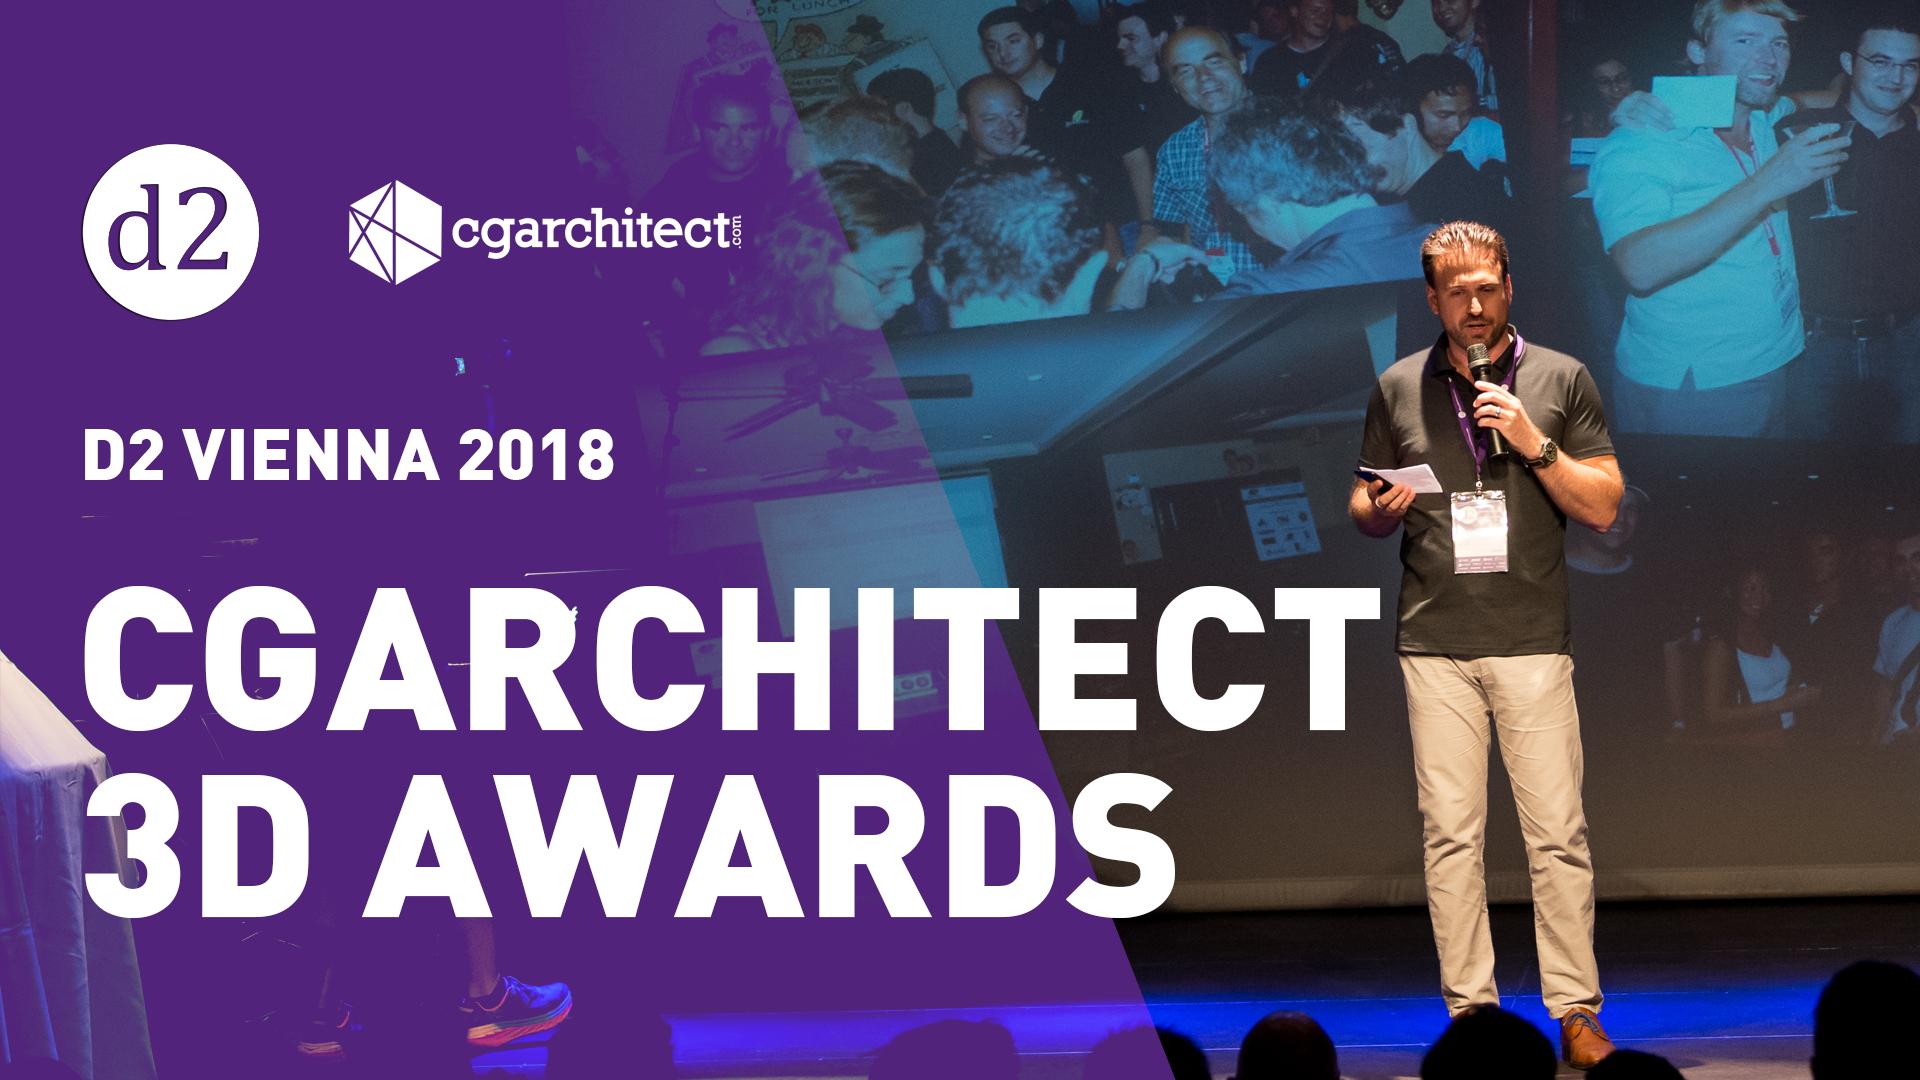 D2 Vienna 2018: Jeff Mottle Presents the CGArchitect 3D Awards